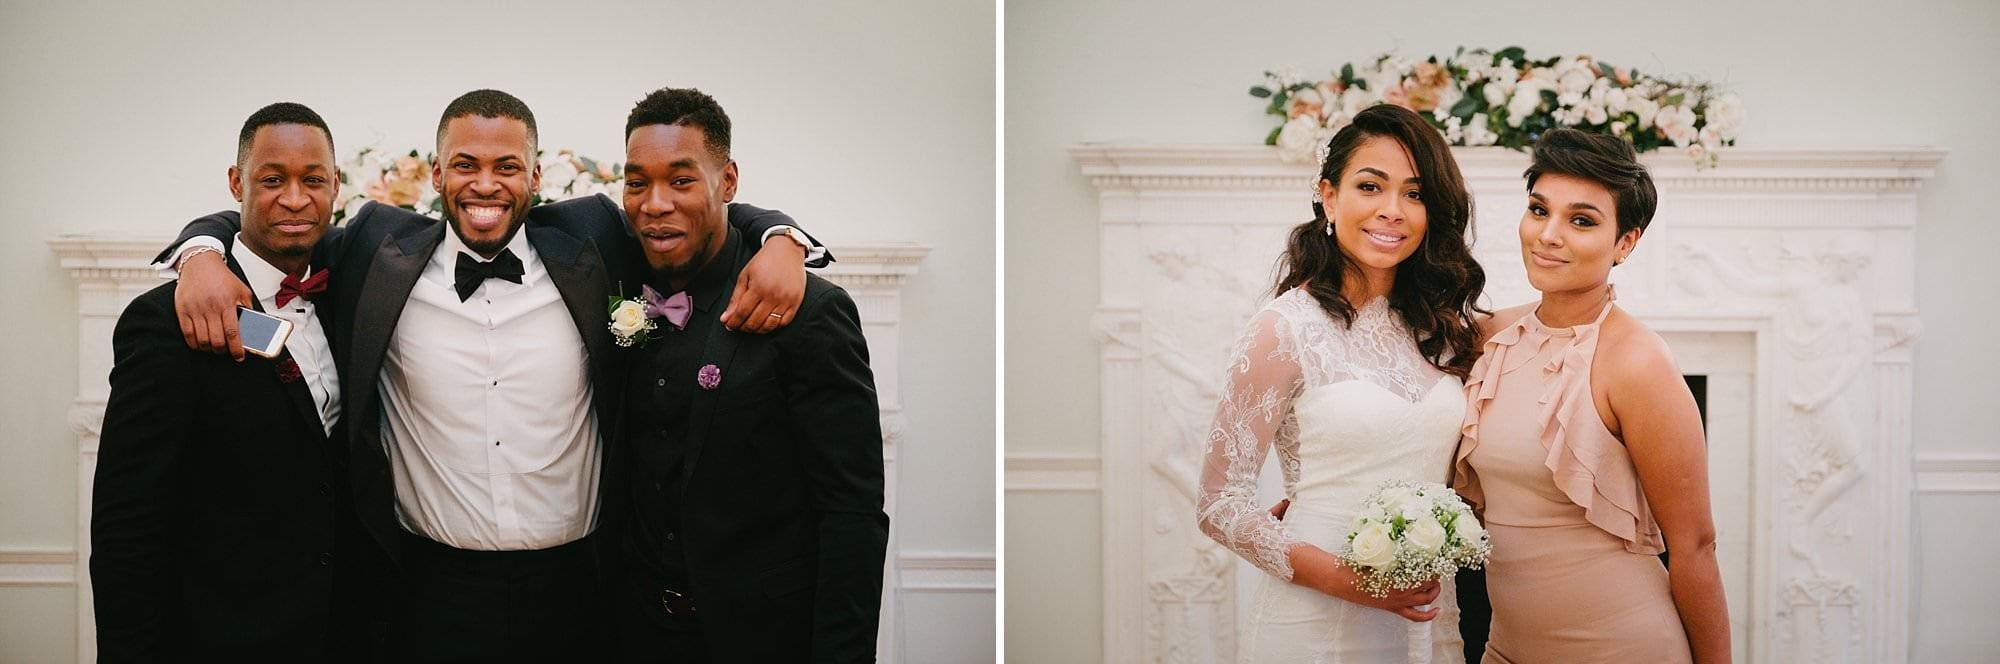 asia house london wedding photographer 030 - Rachel + Gabriel   Asia House Wedding Photography